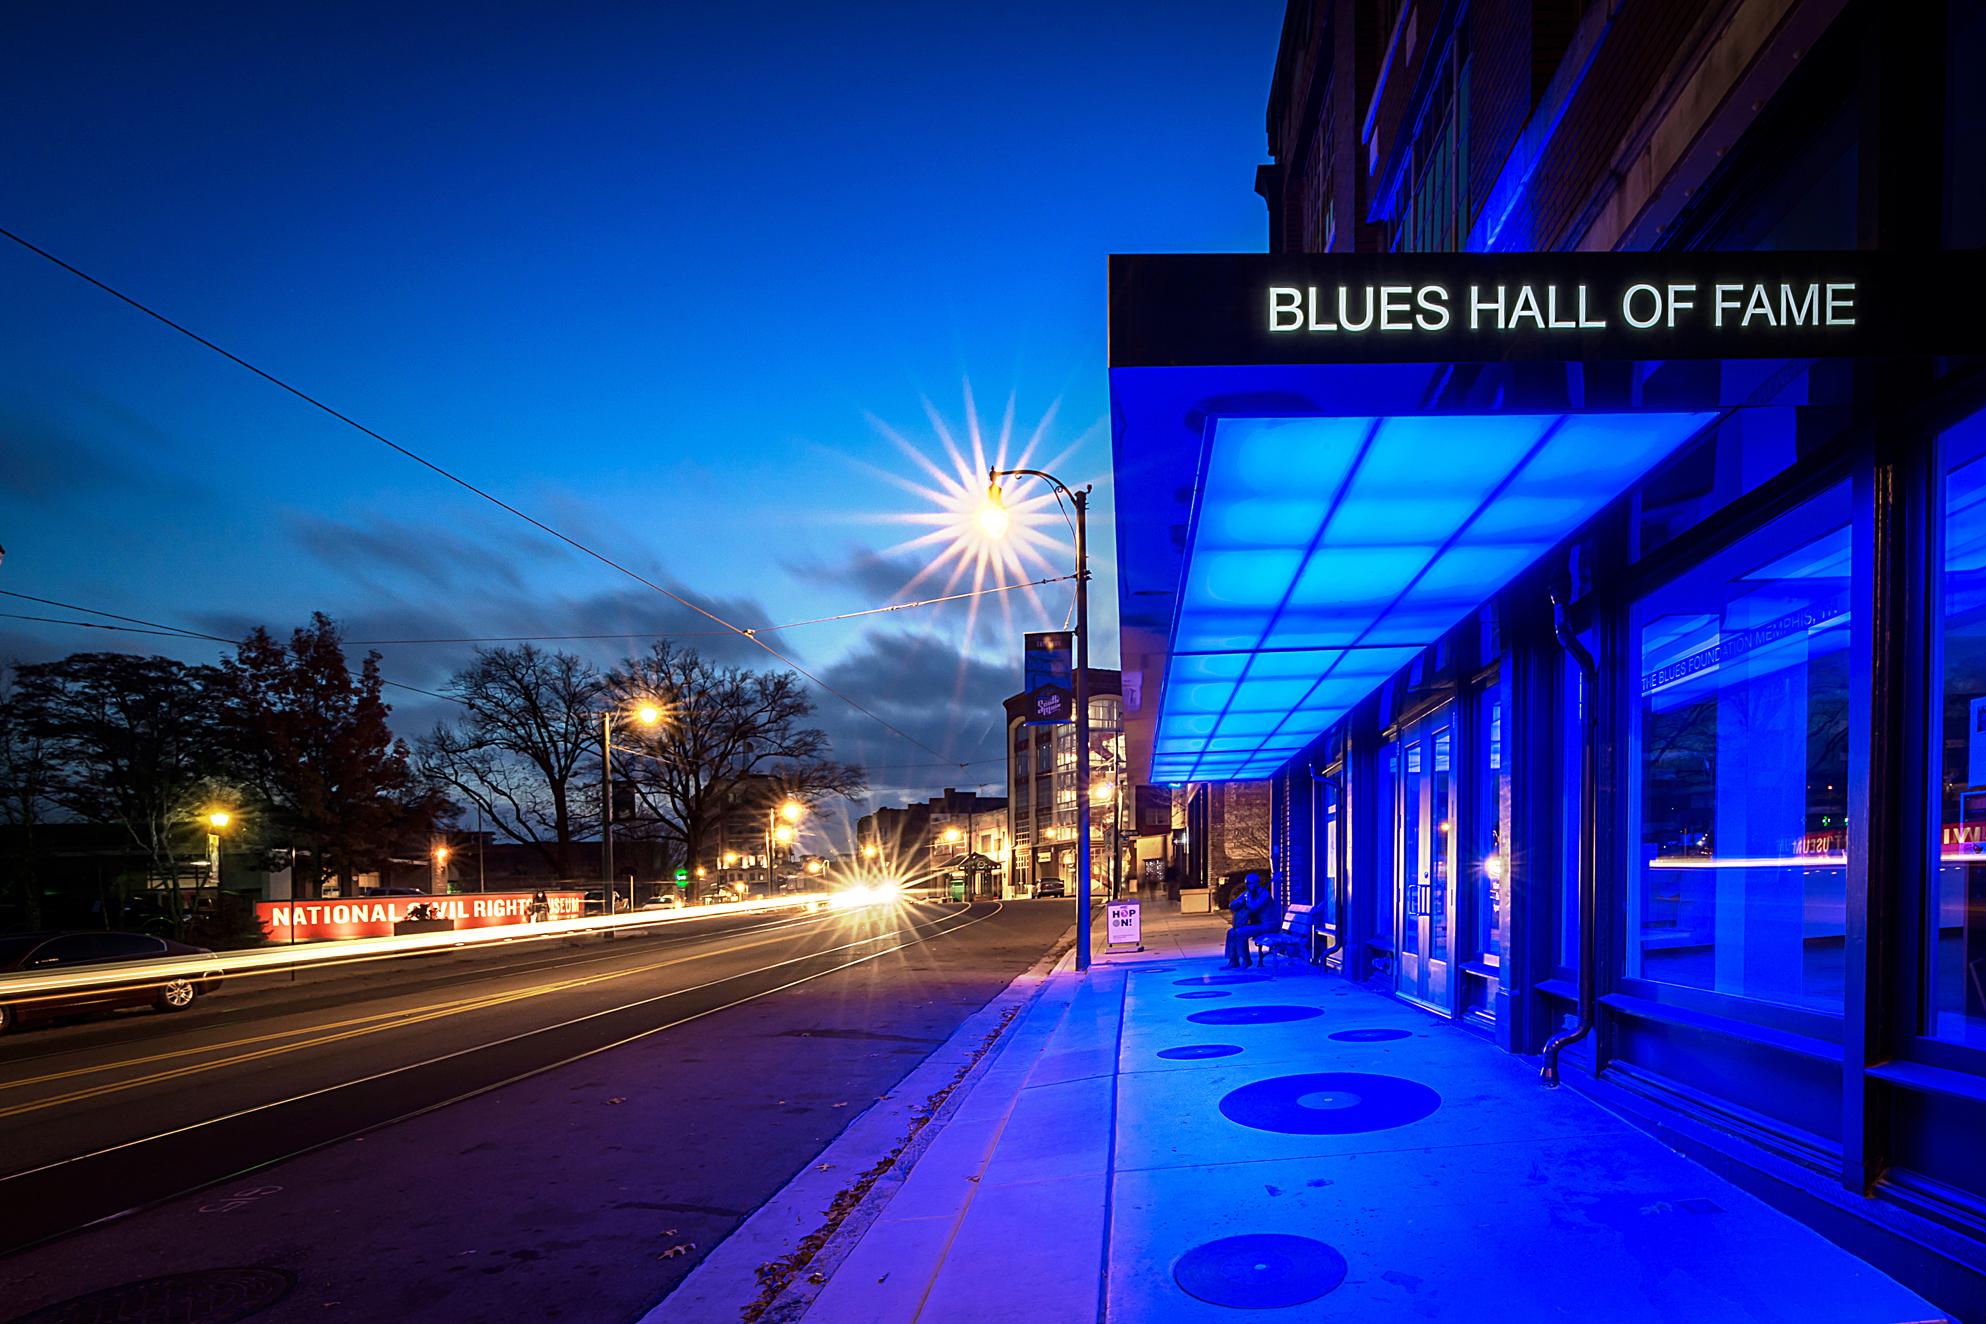 Blues foundation_Dusk Exterior (4 of 4).jpg